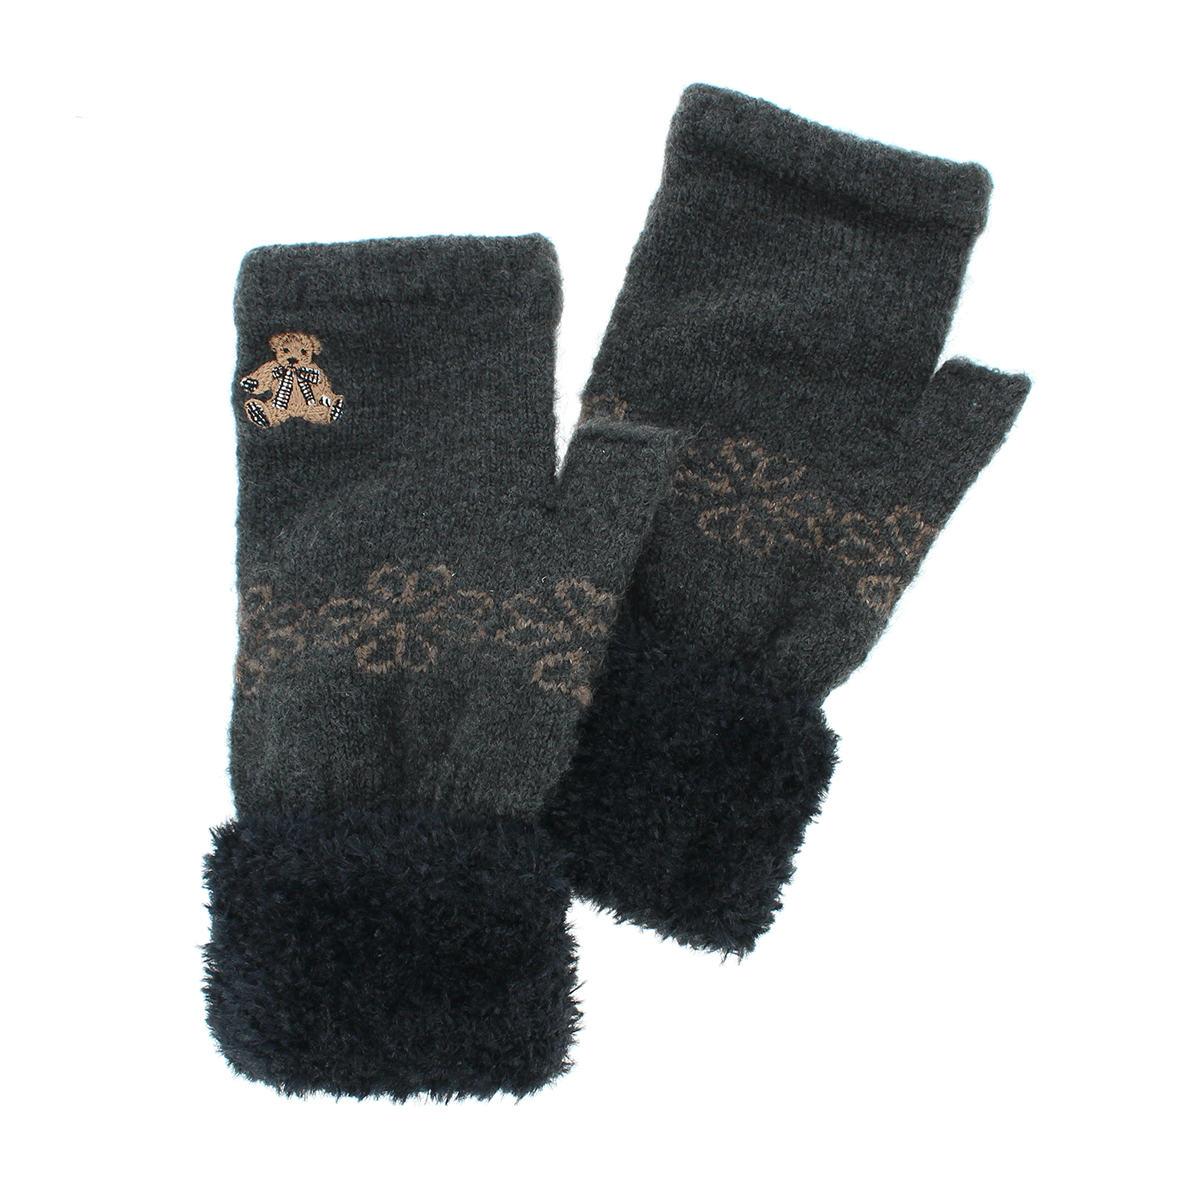 DAKS ダックス レディース ニット手袋 指なし スマホ タッチパネル対応 ボリューミーカフス ワンポイント テディベア刺繍 幾何学模様 雪柄ジャカード